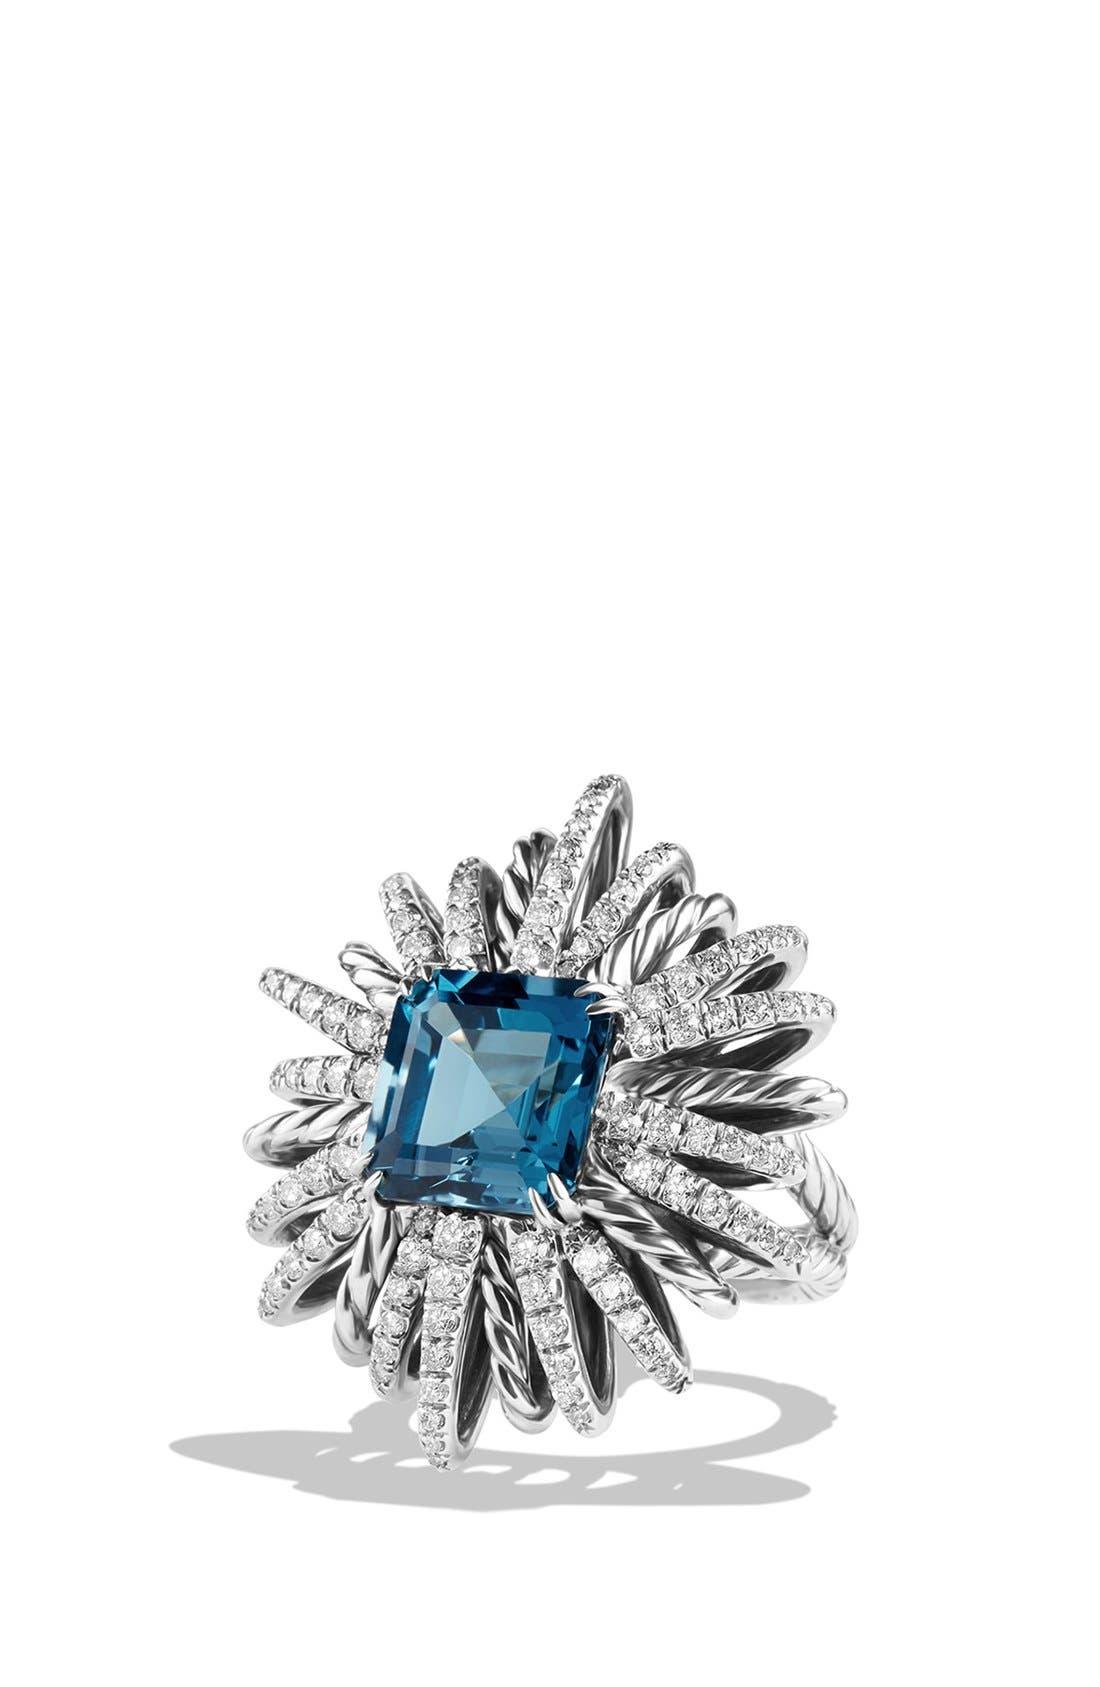 'Starburst' Ring with Semiprecious Stone and Diamonds,                         Main,                         color, Hampton Blue Topaz